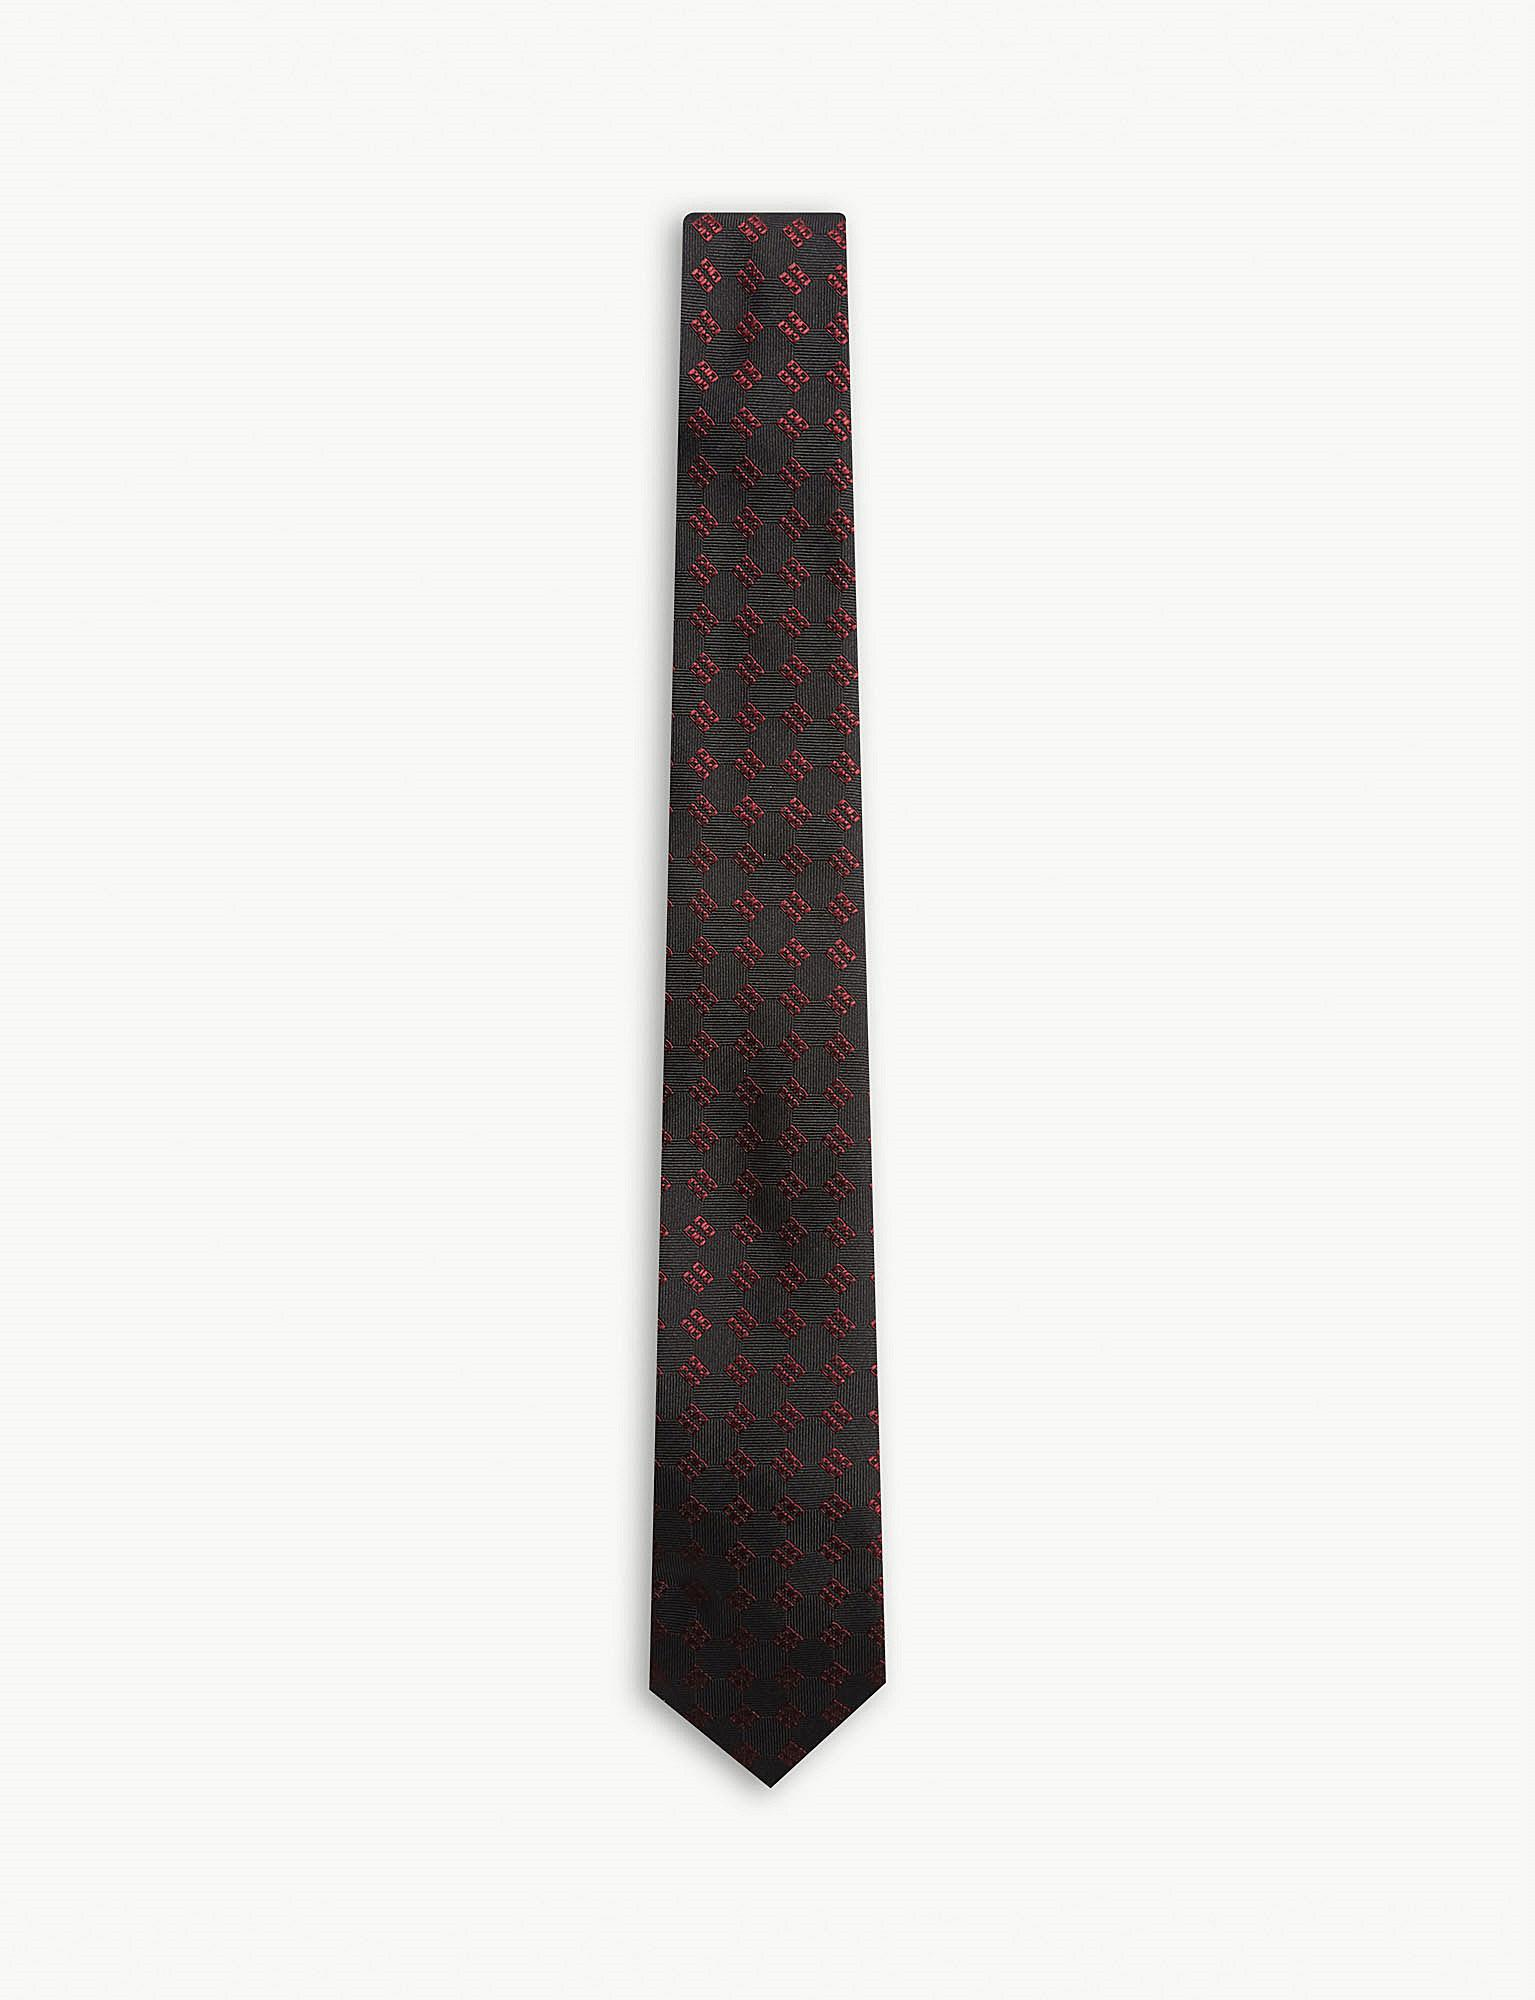 Black and White 4G Tie Givenchy 6ZcoXu